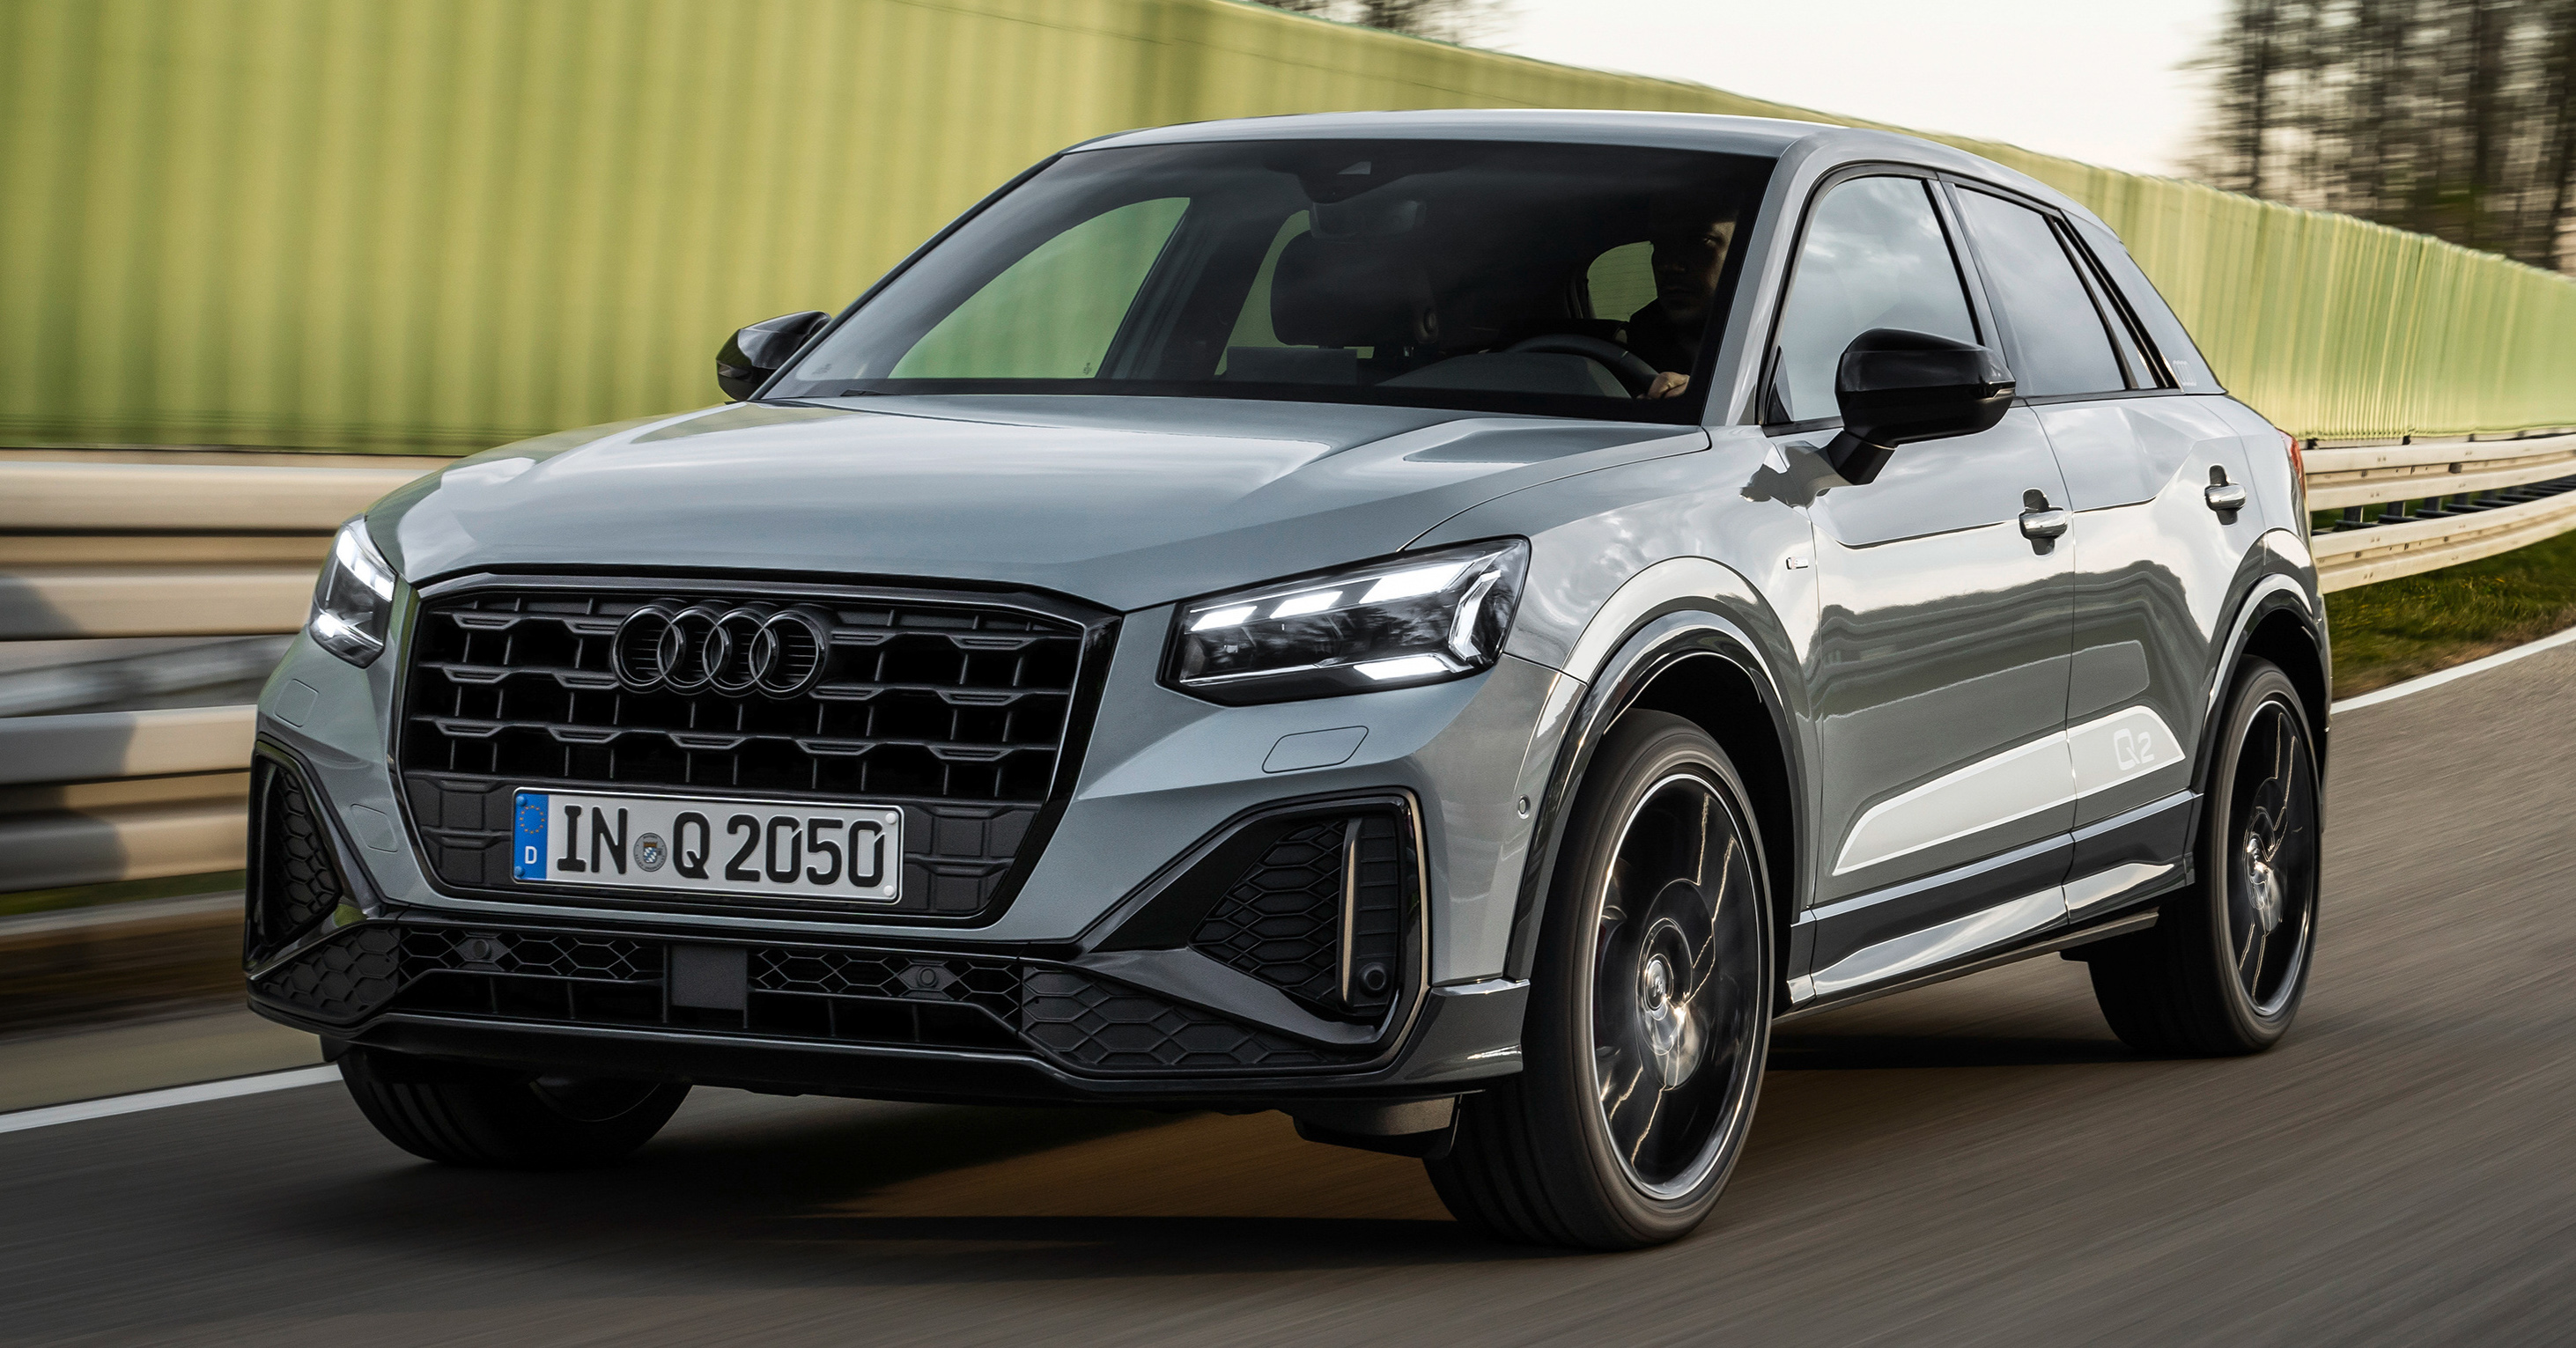 2021 Audi Q2 Facelift in Arrow Grey_Exterior - Paul Tan's Automotive News